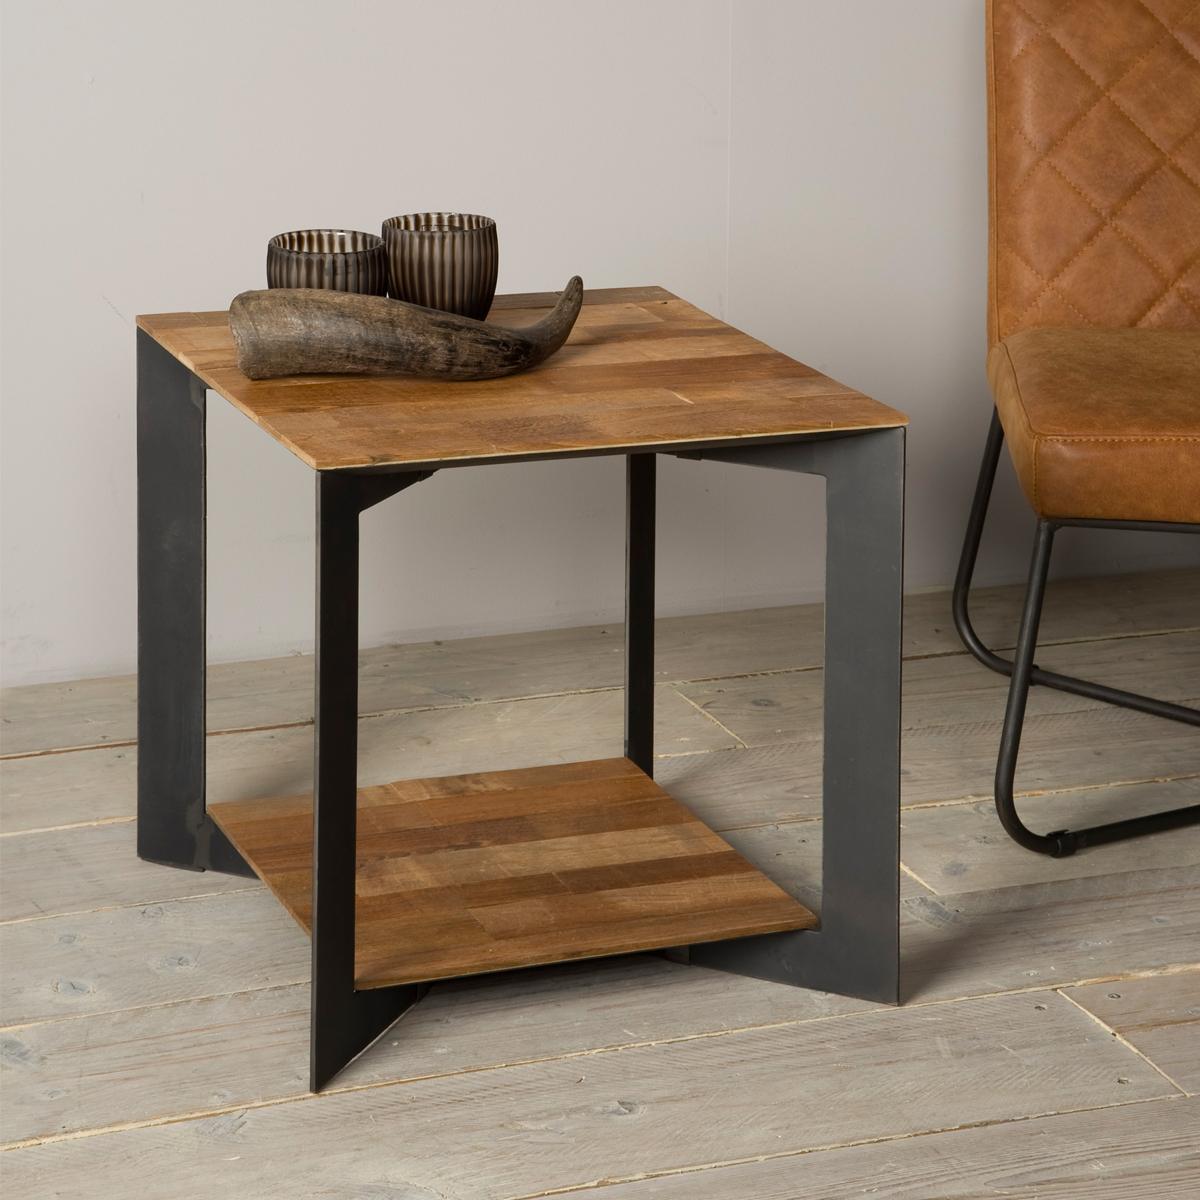 Hoektafel van hout en metaal